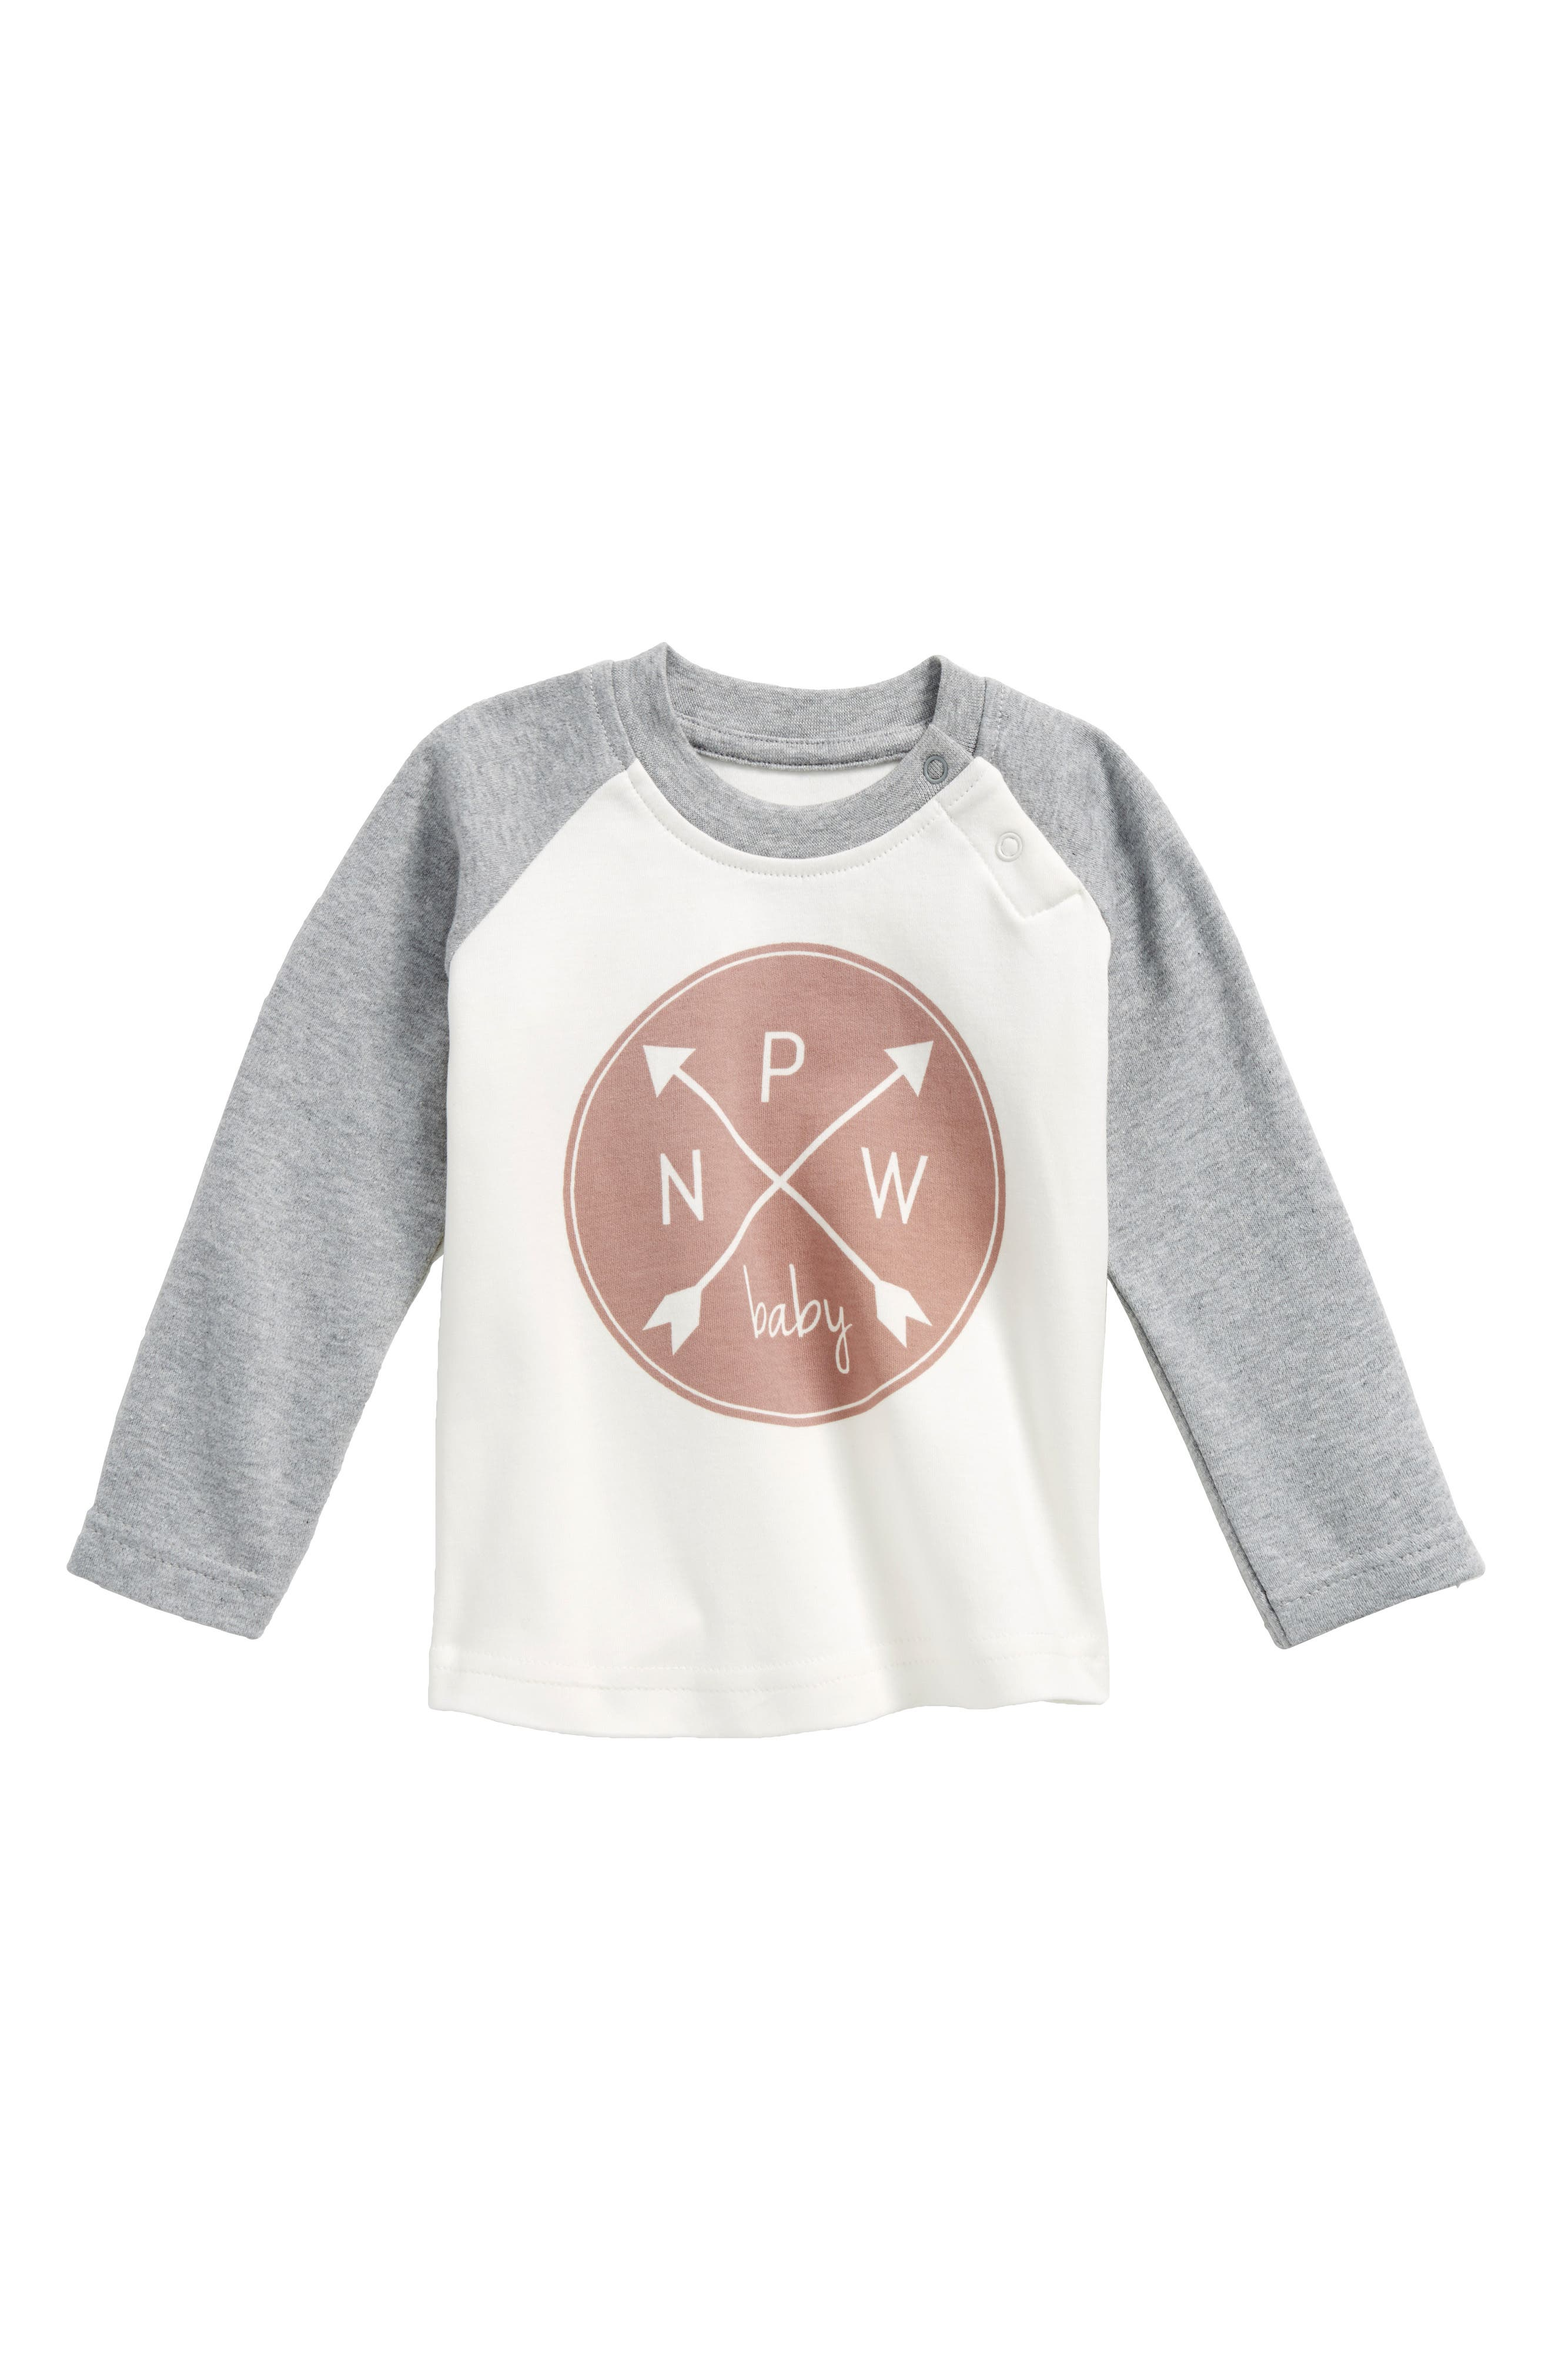 Main Image - City Mouse PNW Logo Organic Cotton Tee (Baby Girls)